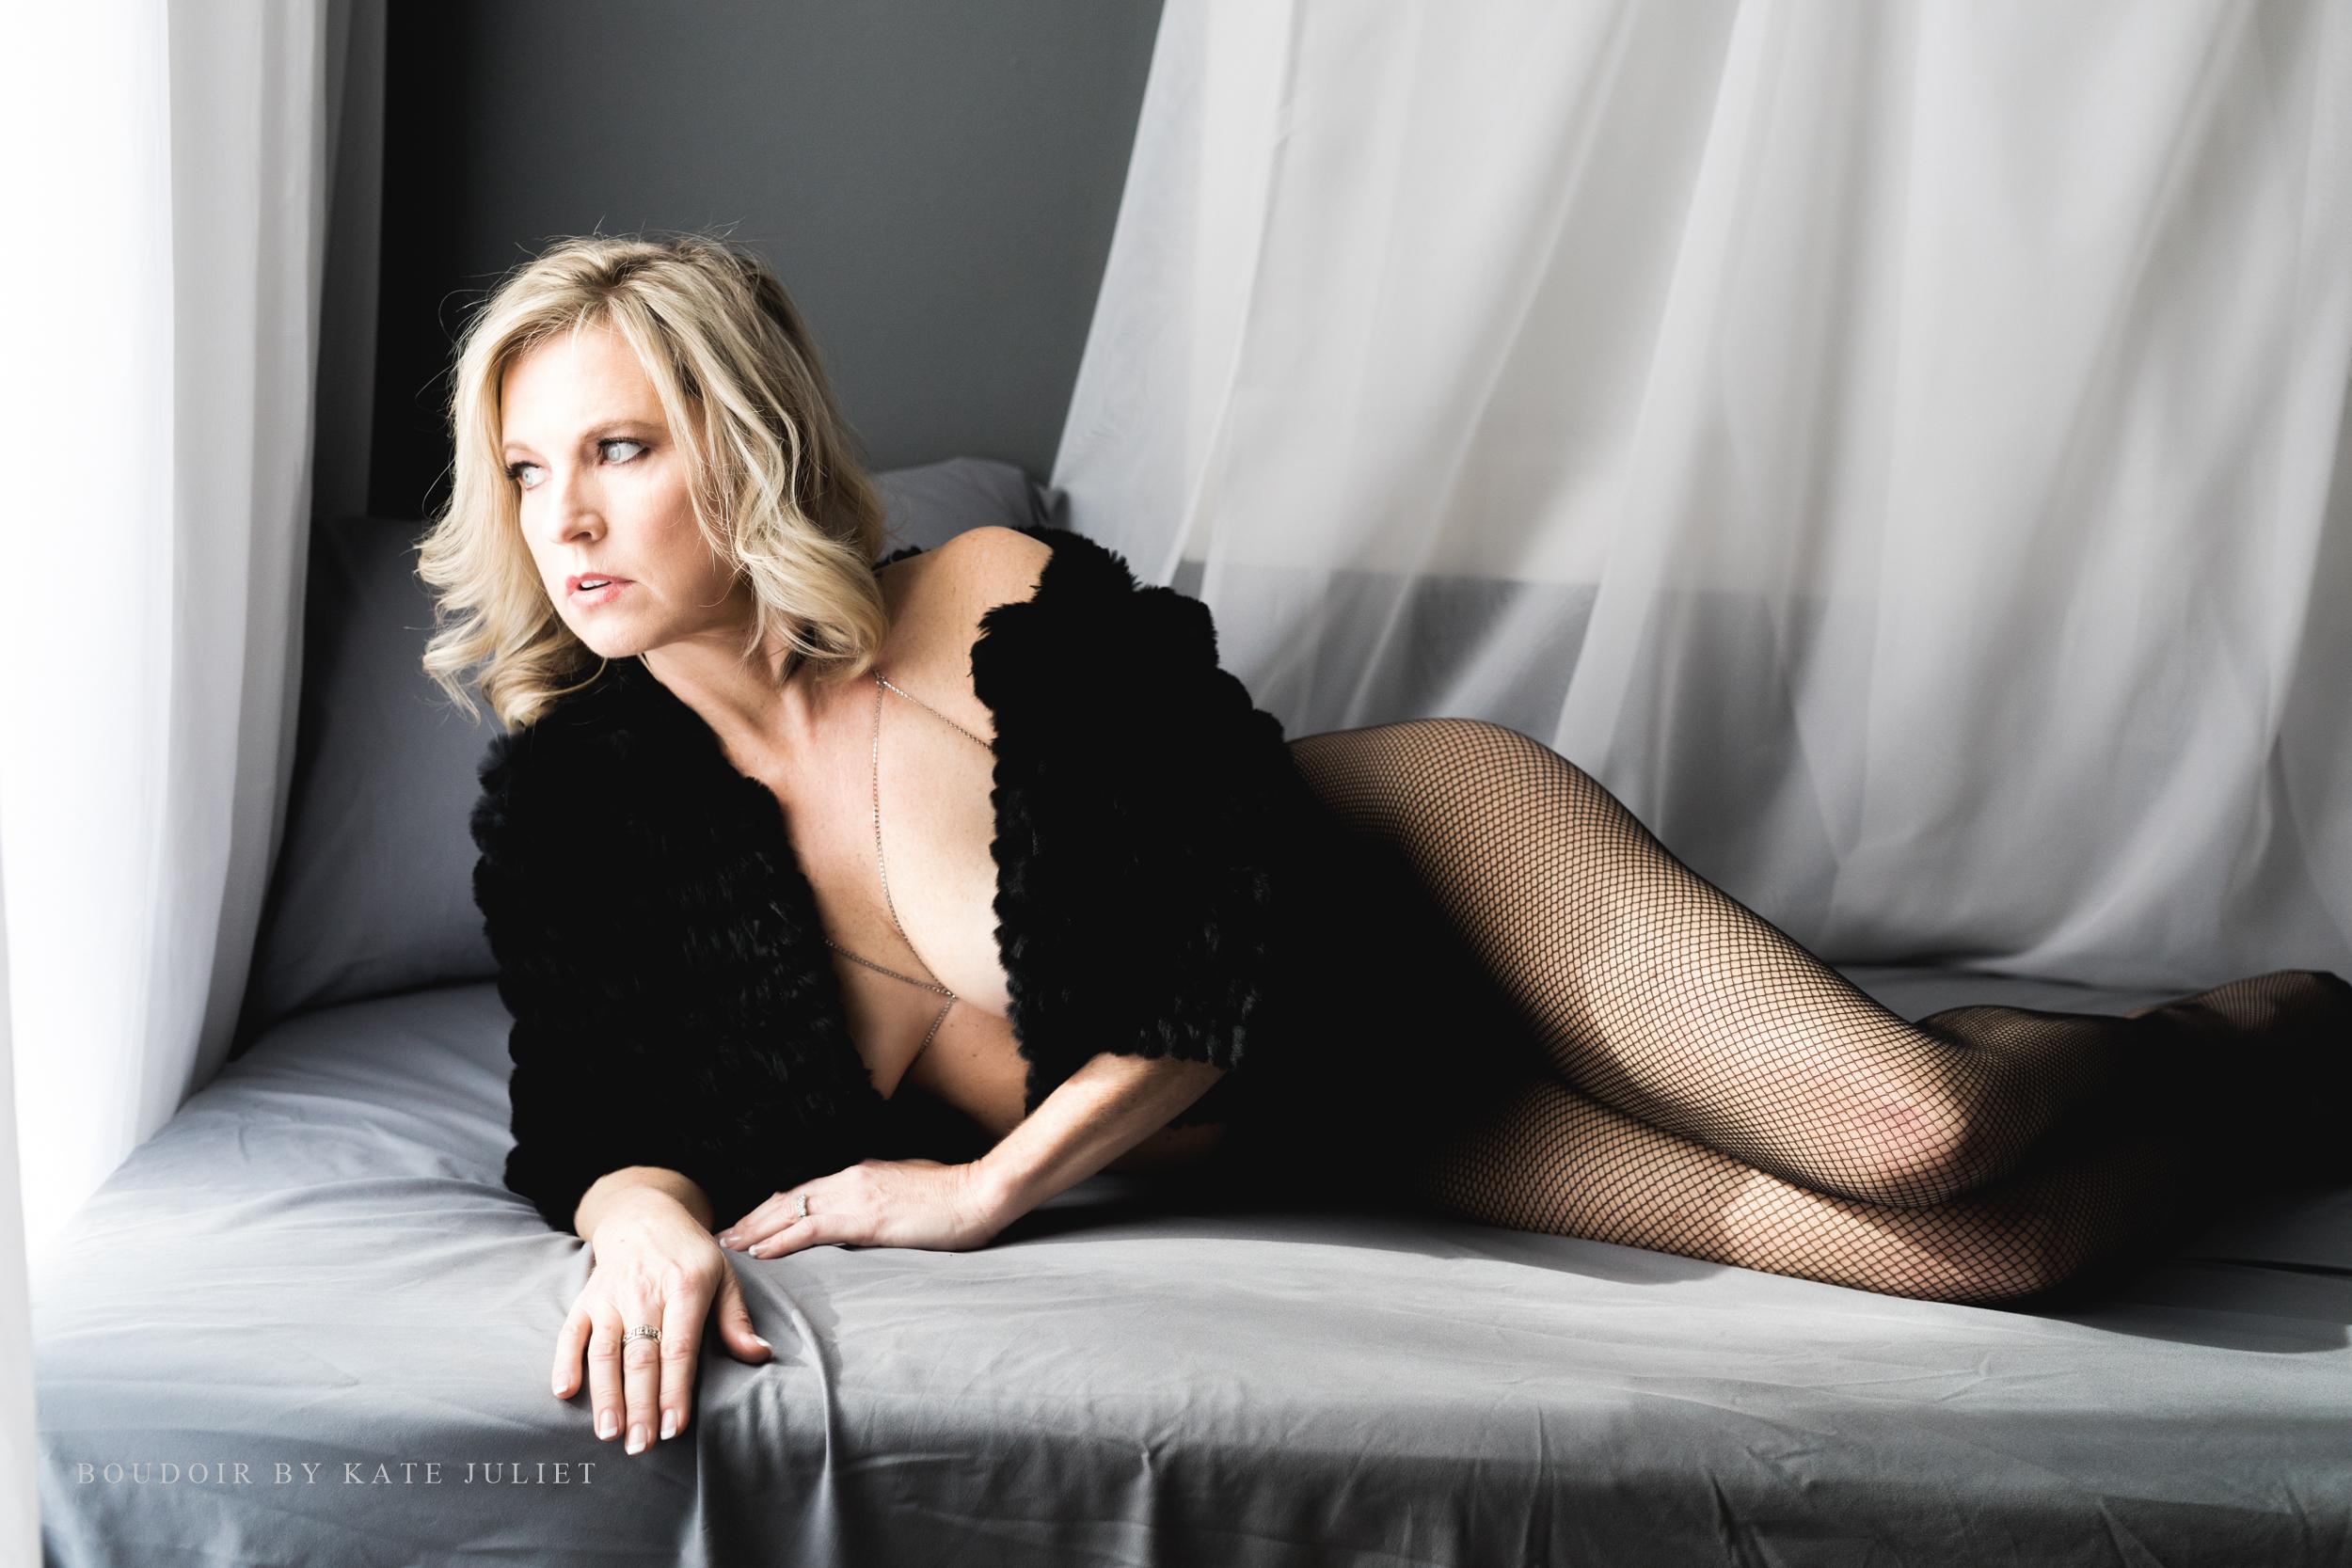 kate juliet photography - boudoir - web-119.jpg